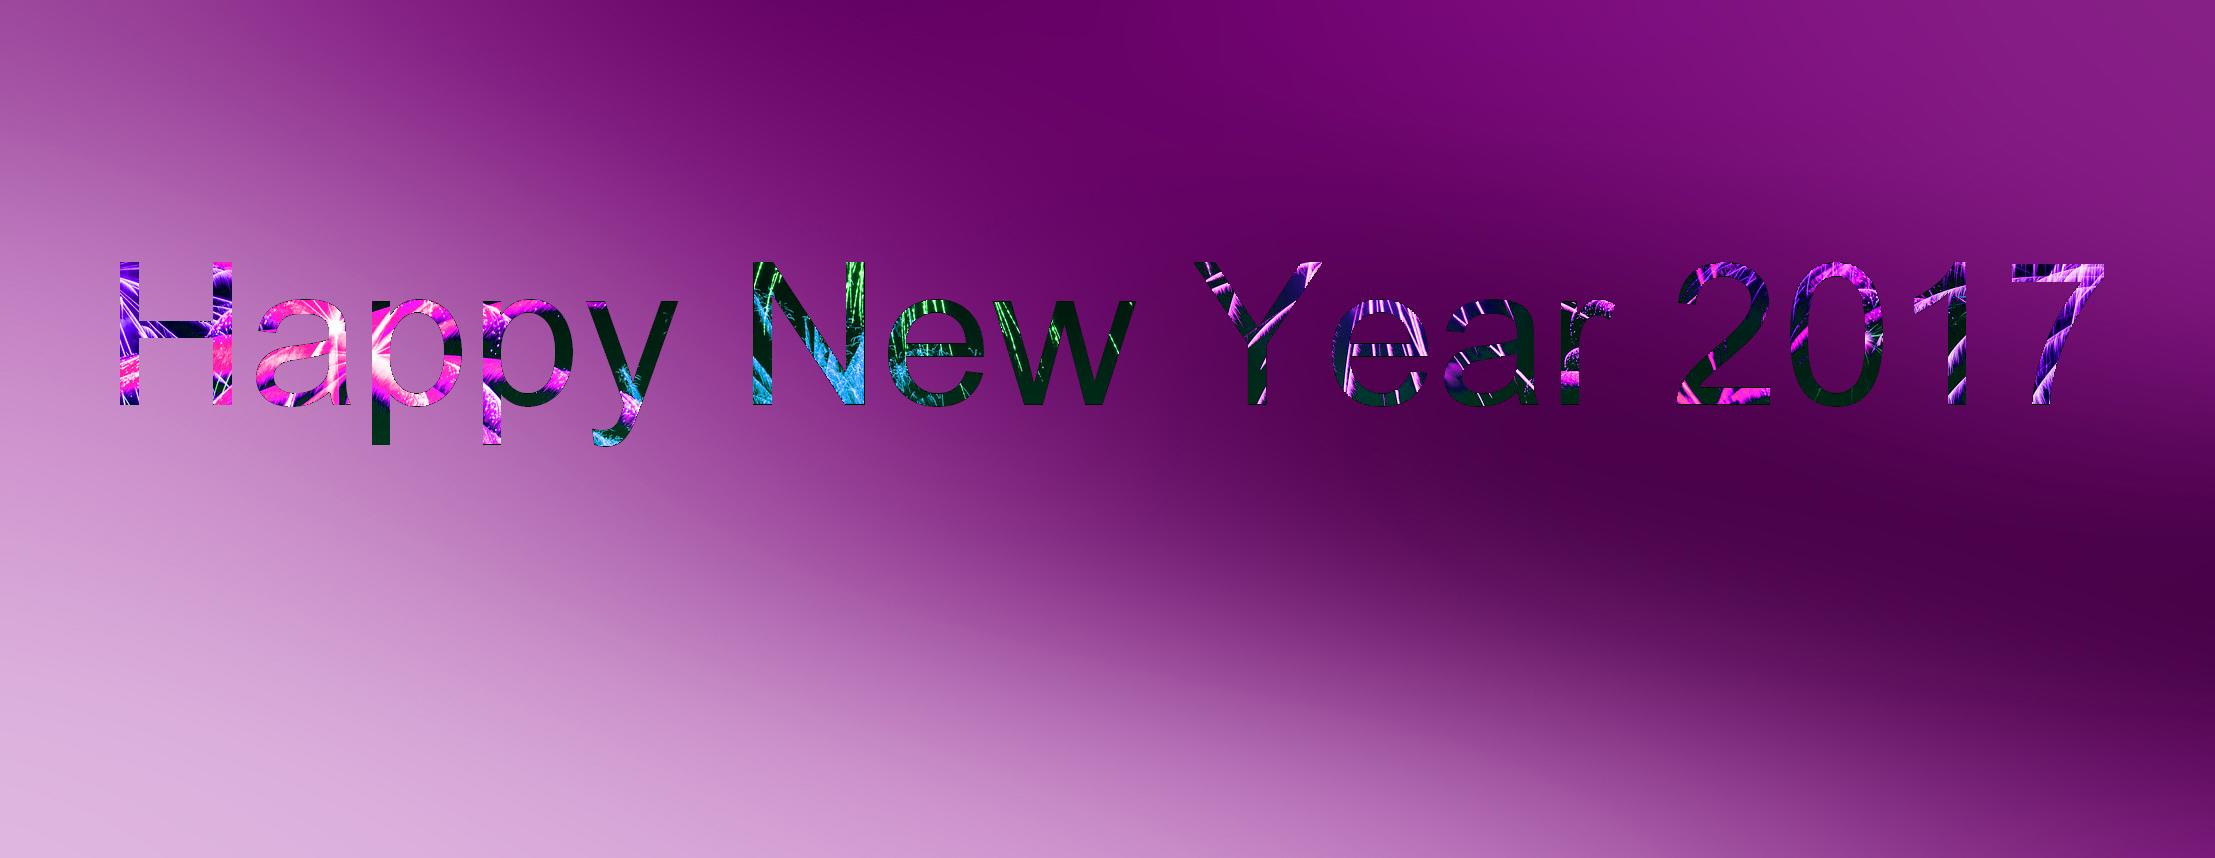 Happy New Year 2017 by lecristal